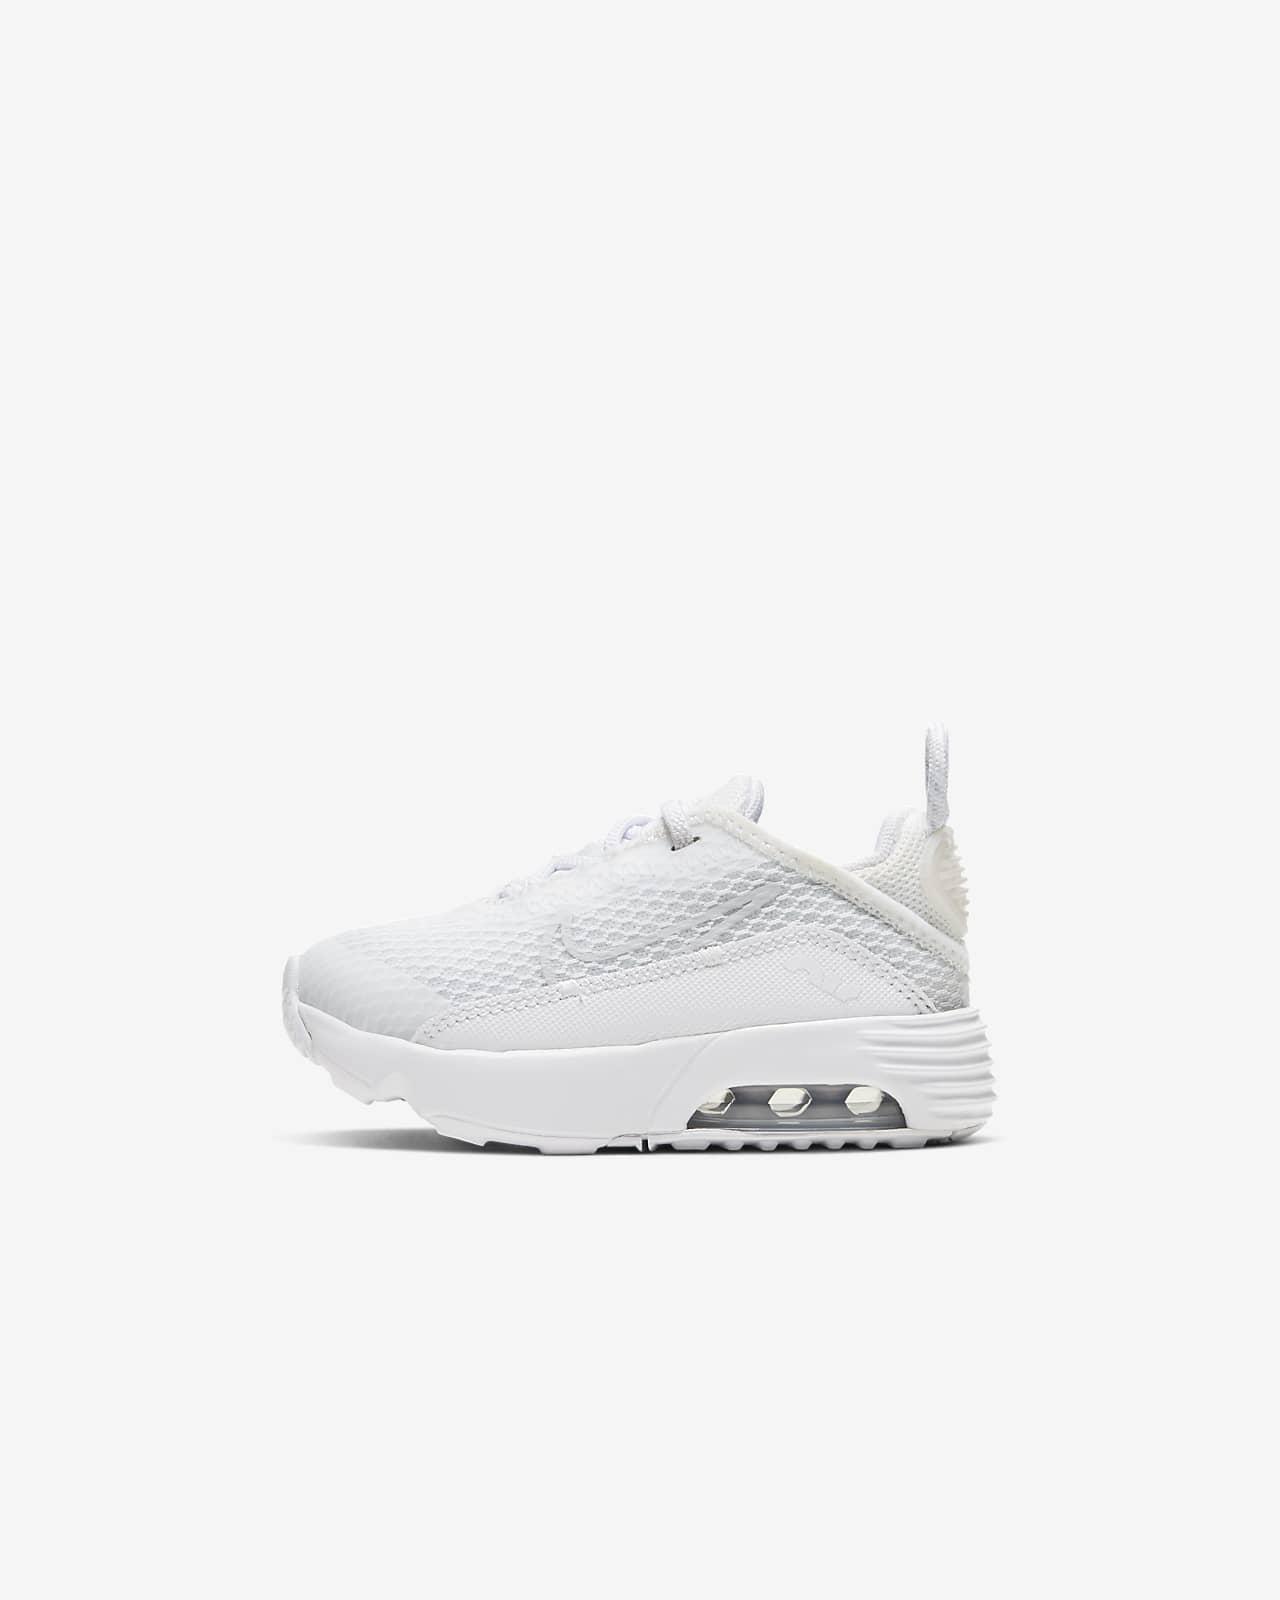 Nike Air Max 2090 sko til sped-/småbarn